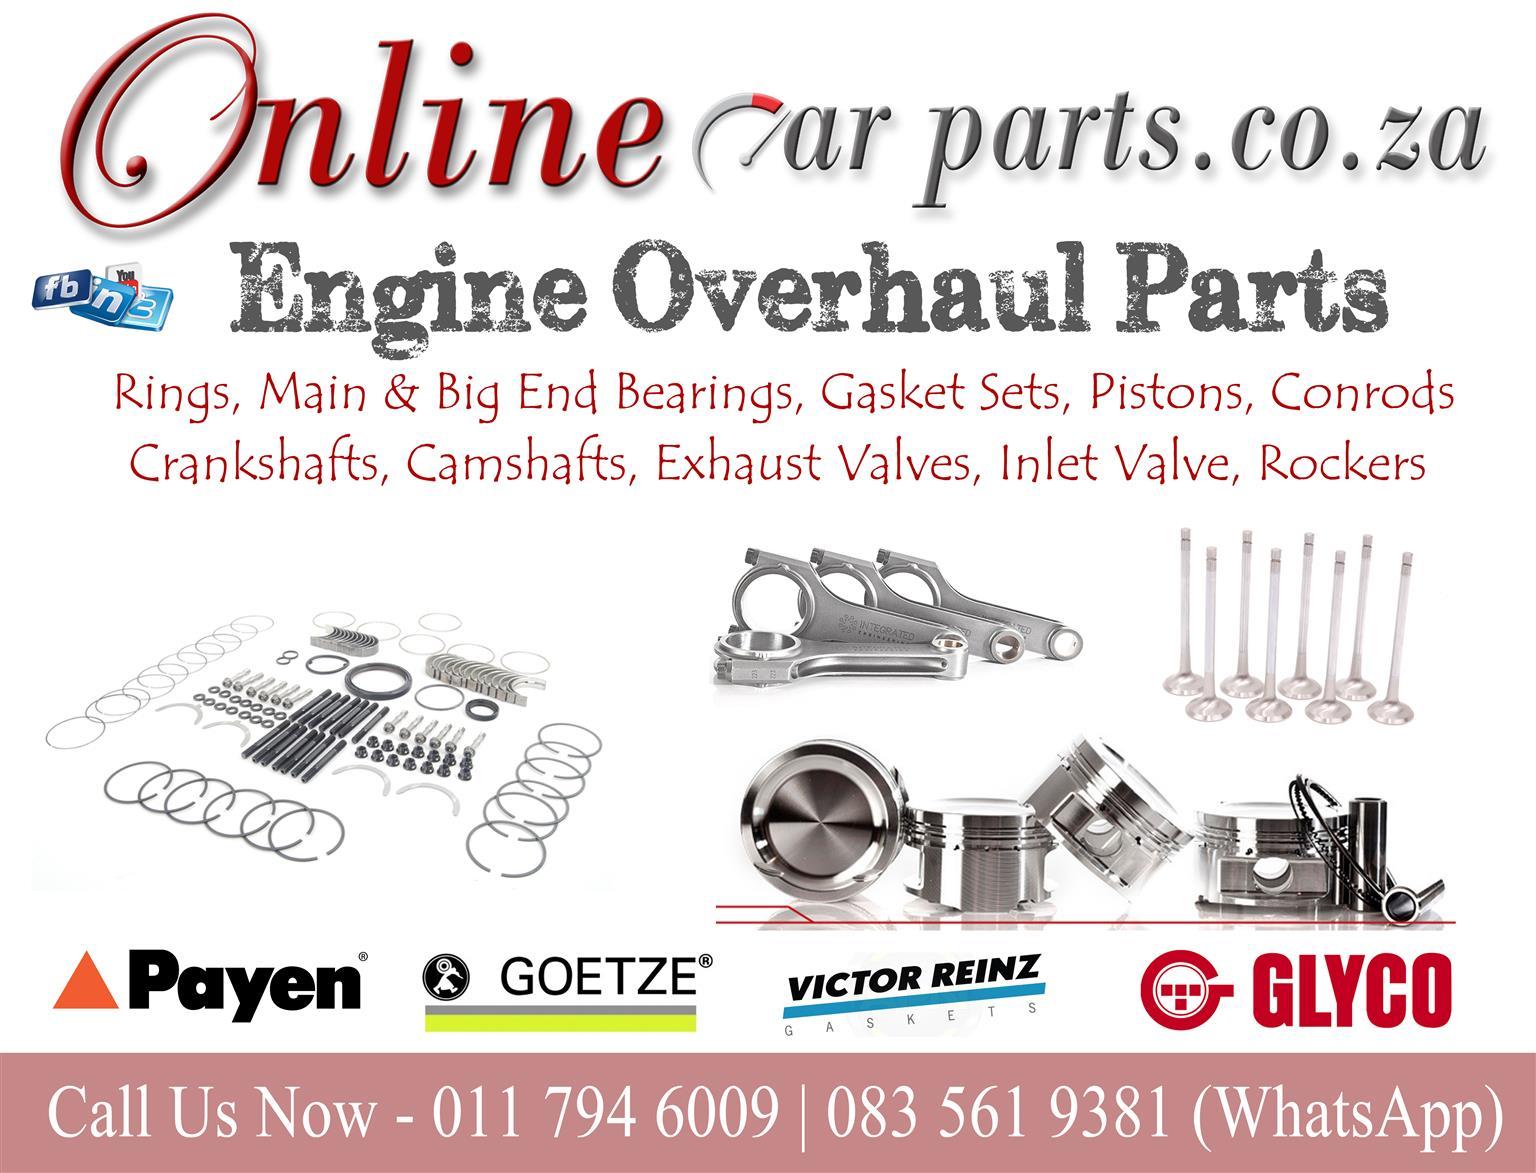 High Quality Engine Overhaul Parts Rings, Main & Big End Bearings, Gasket Sets, Pistons, Conrods, Crankshafts, Camshafts, Exhaust Valves, Inlet Valve, Rockers